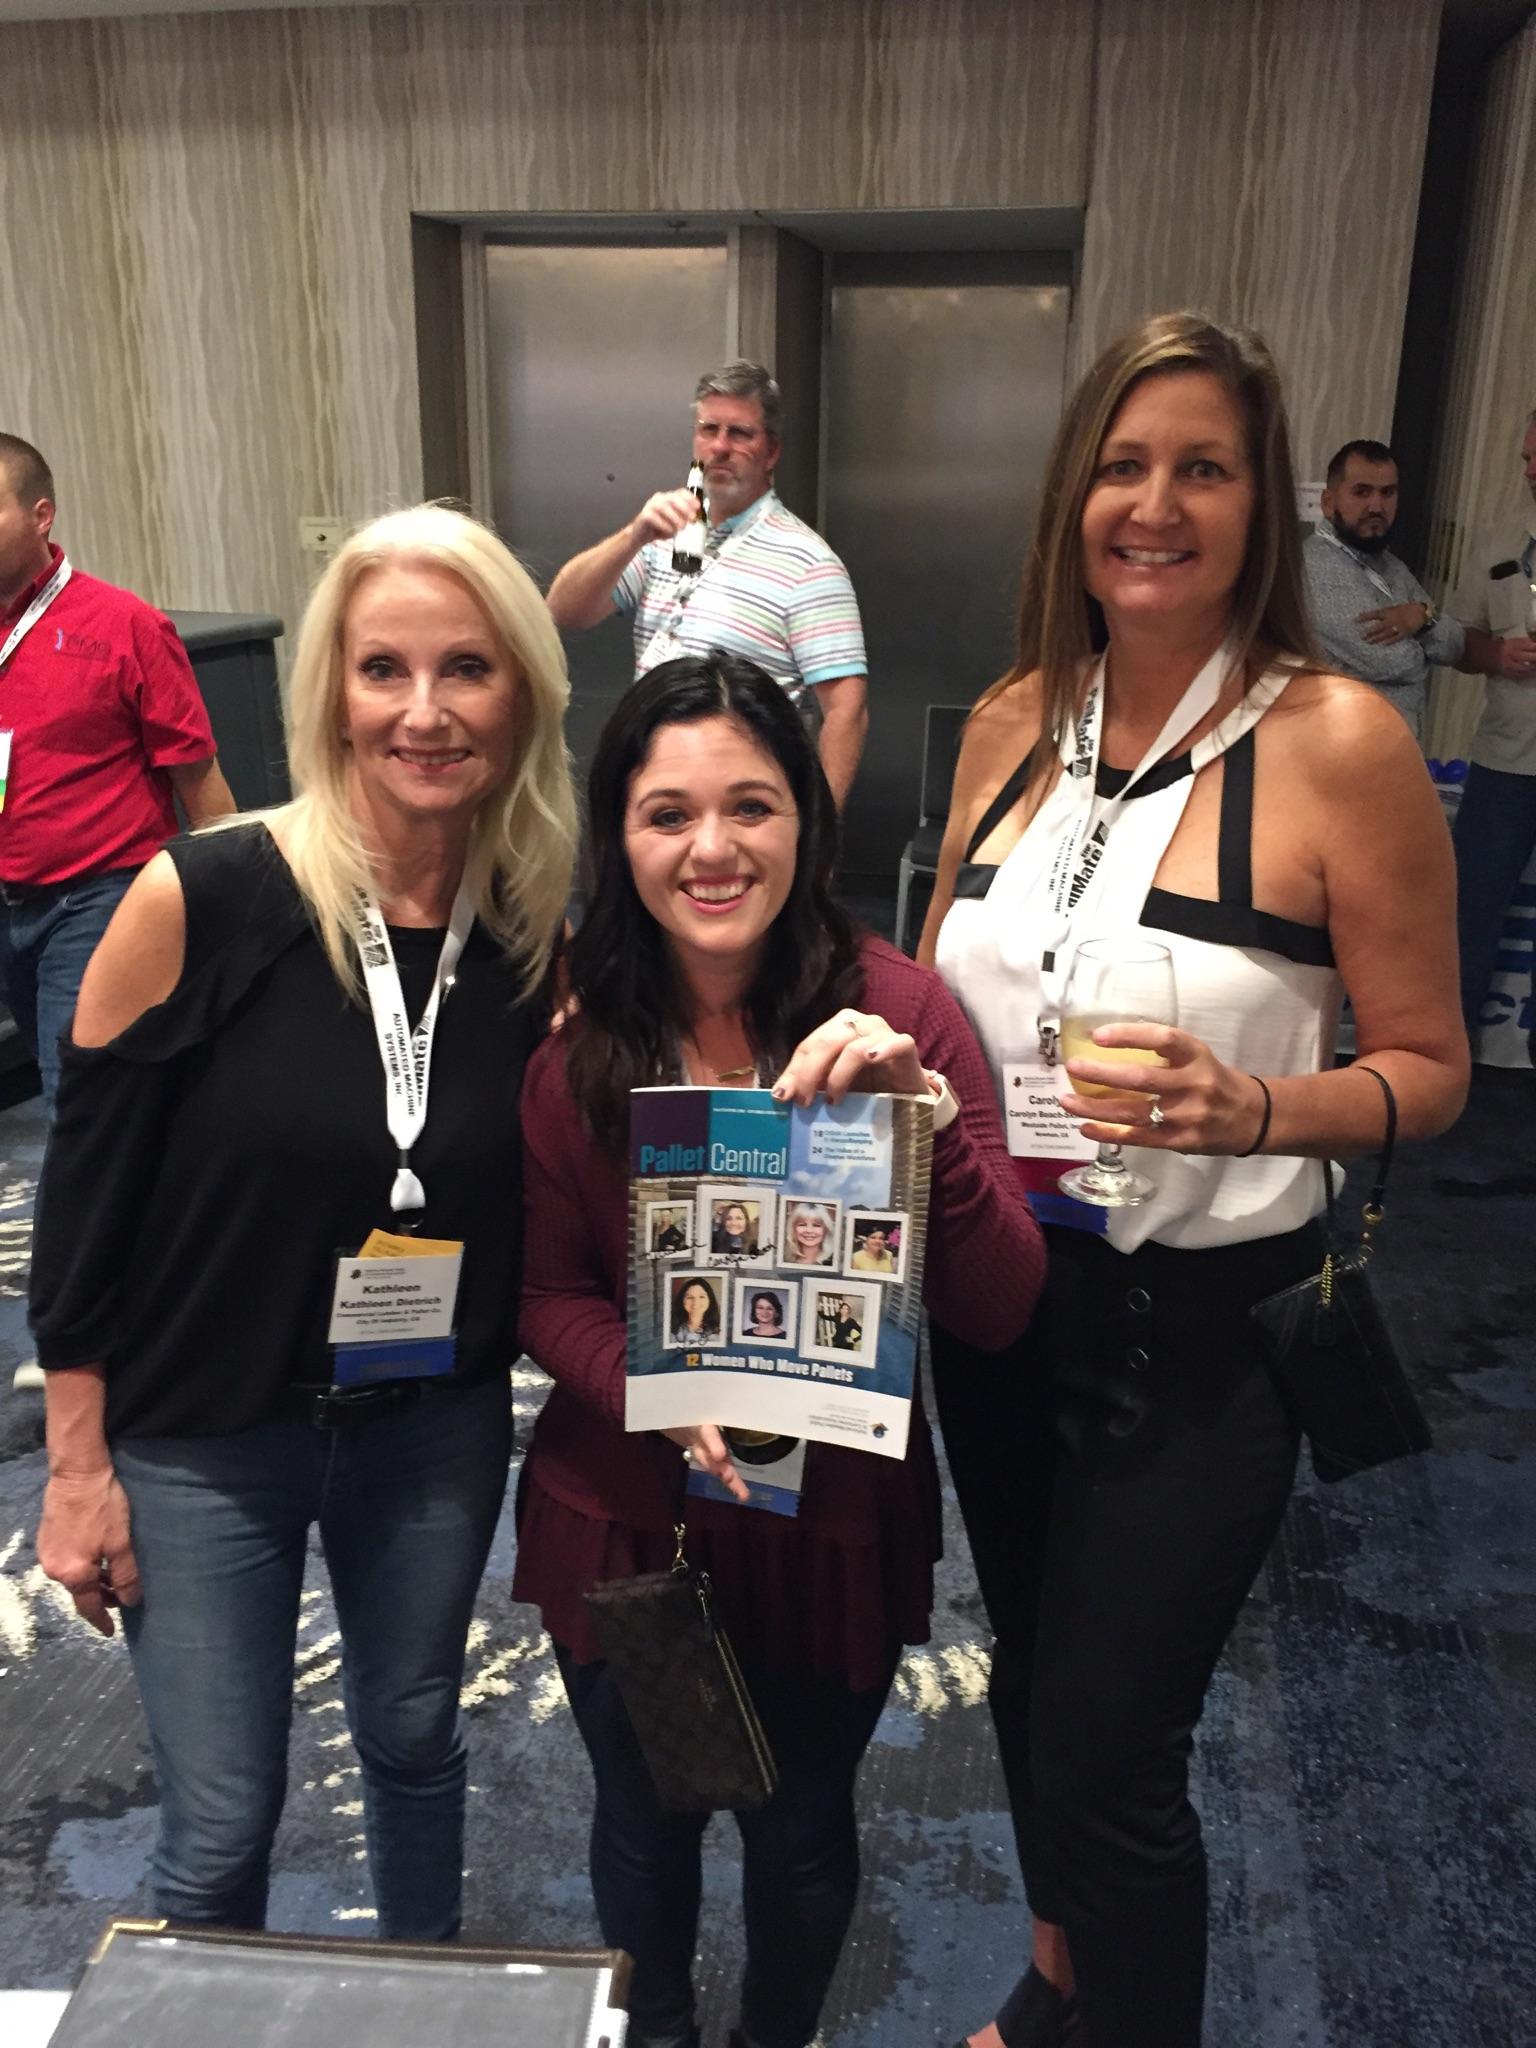 L to R: Kathleen Dietrich of Commercial Lumber/Priority Pallet, Lindsey Shean, Carolyn Beach-Skinner of Westside Pallet